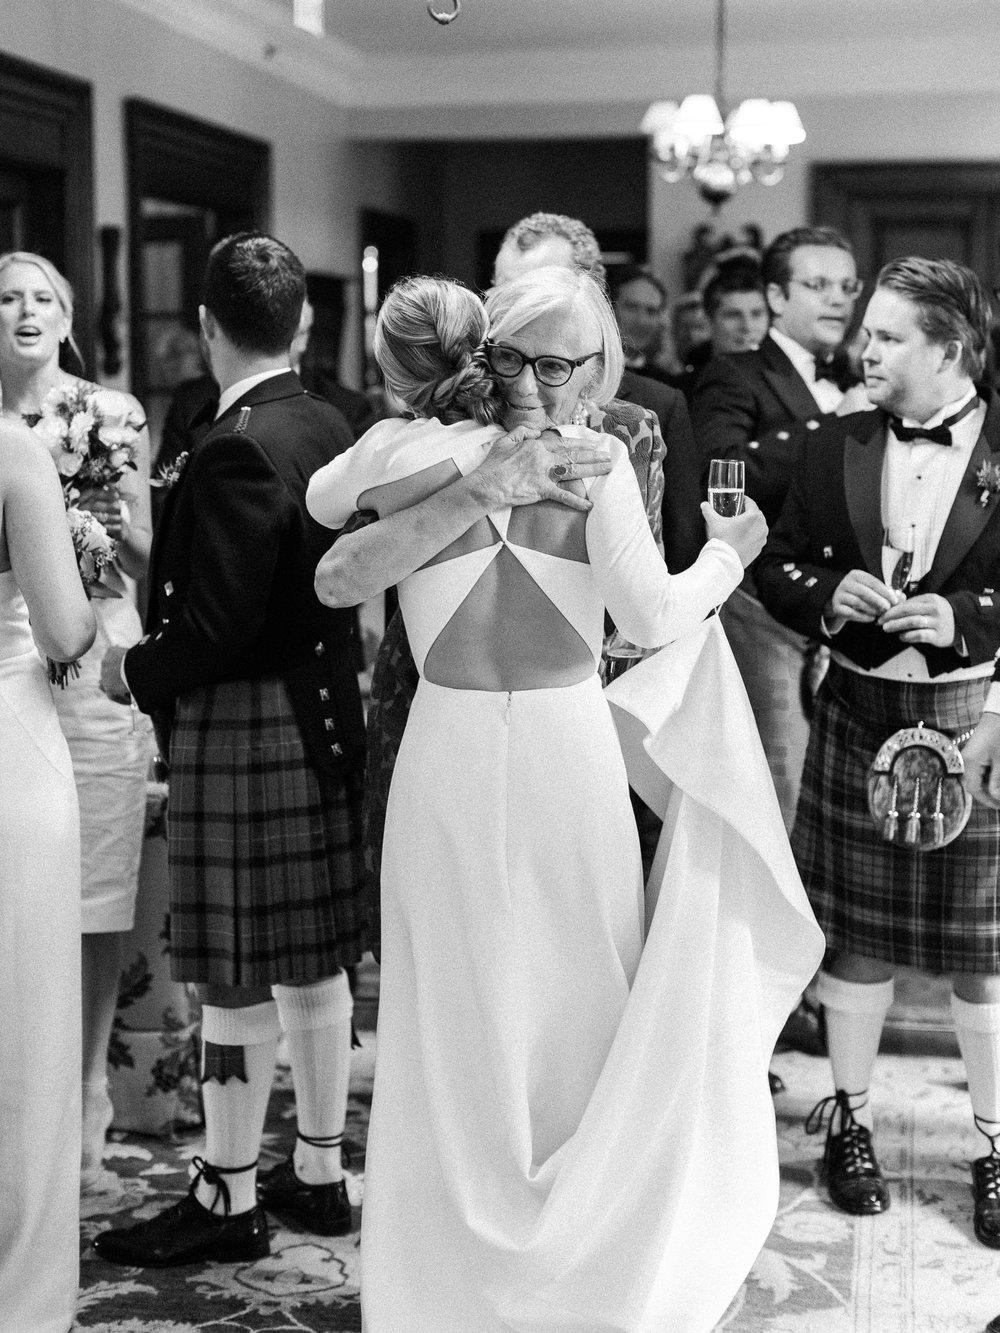 0529-Geneva-Ian-Wedding-Toronto Golf Club-When He Found Her-TorontoPhotographer.jpg